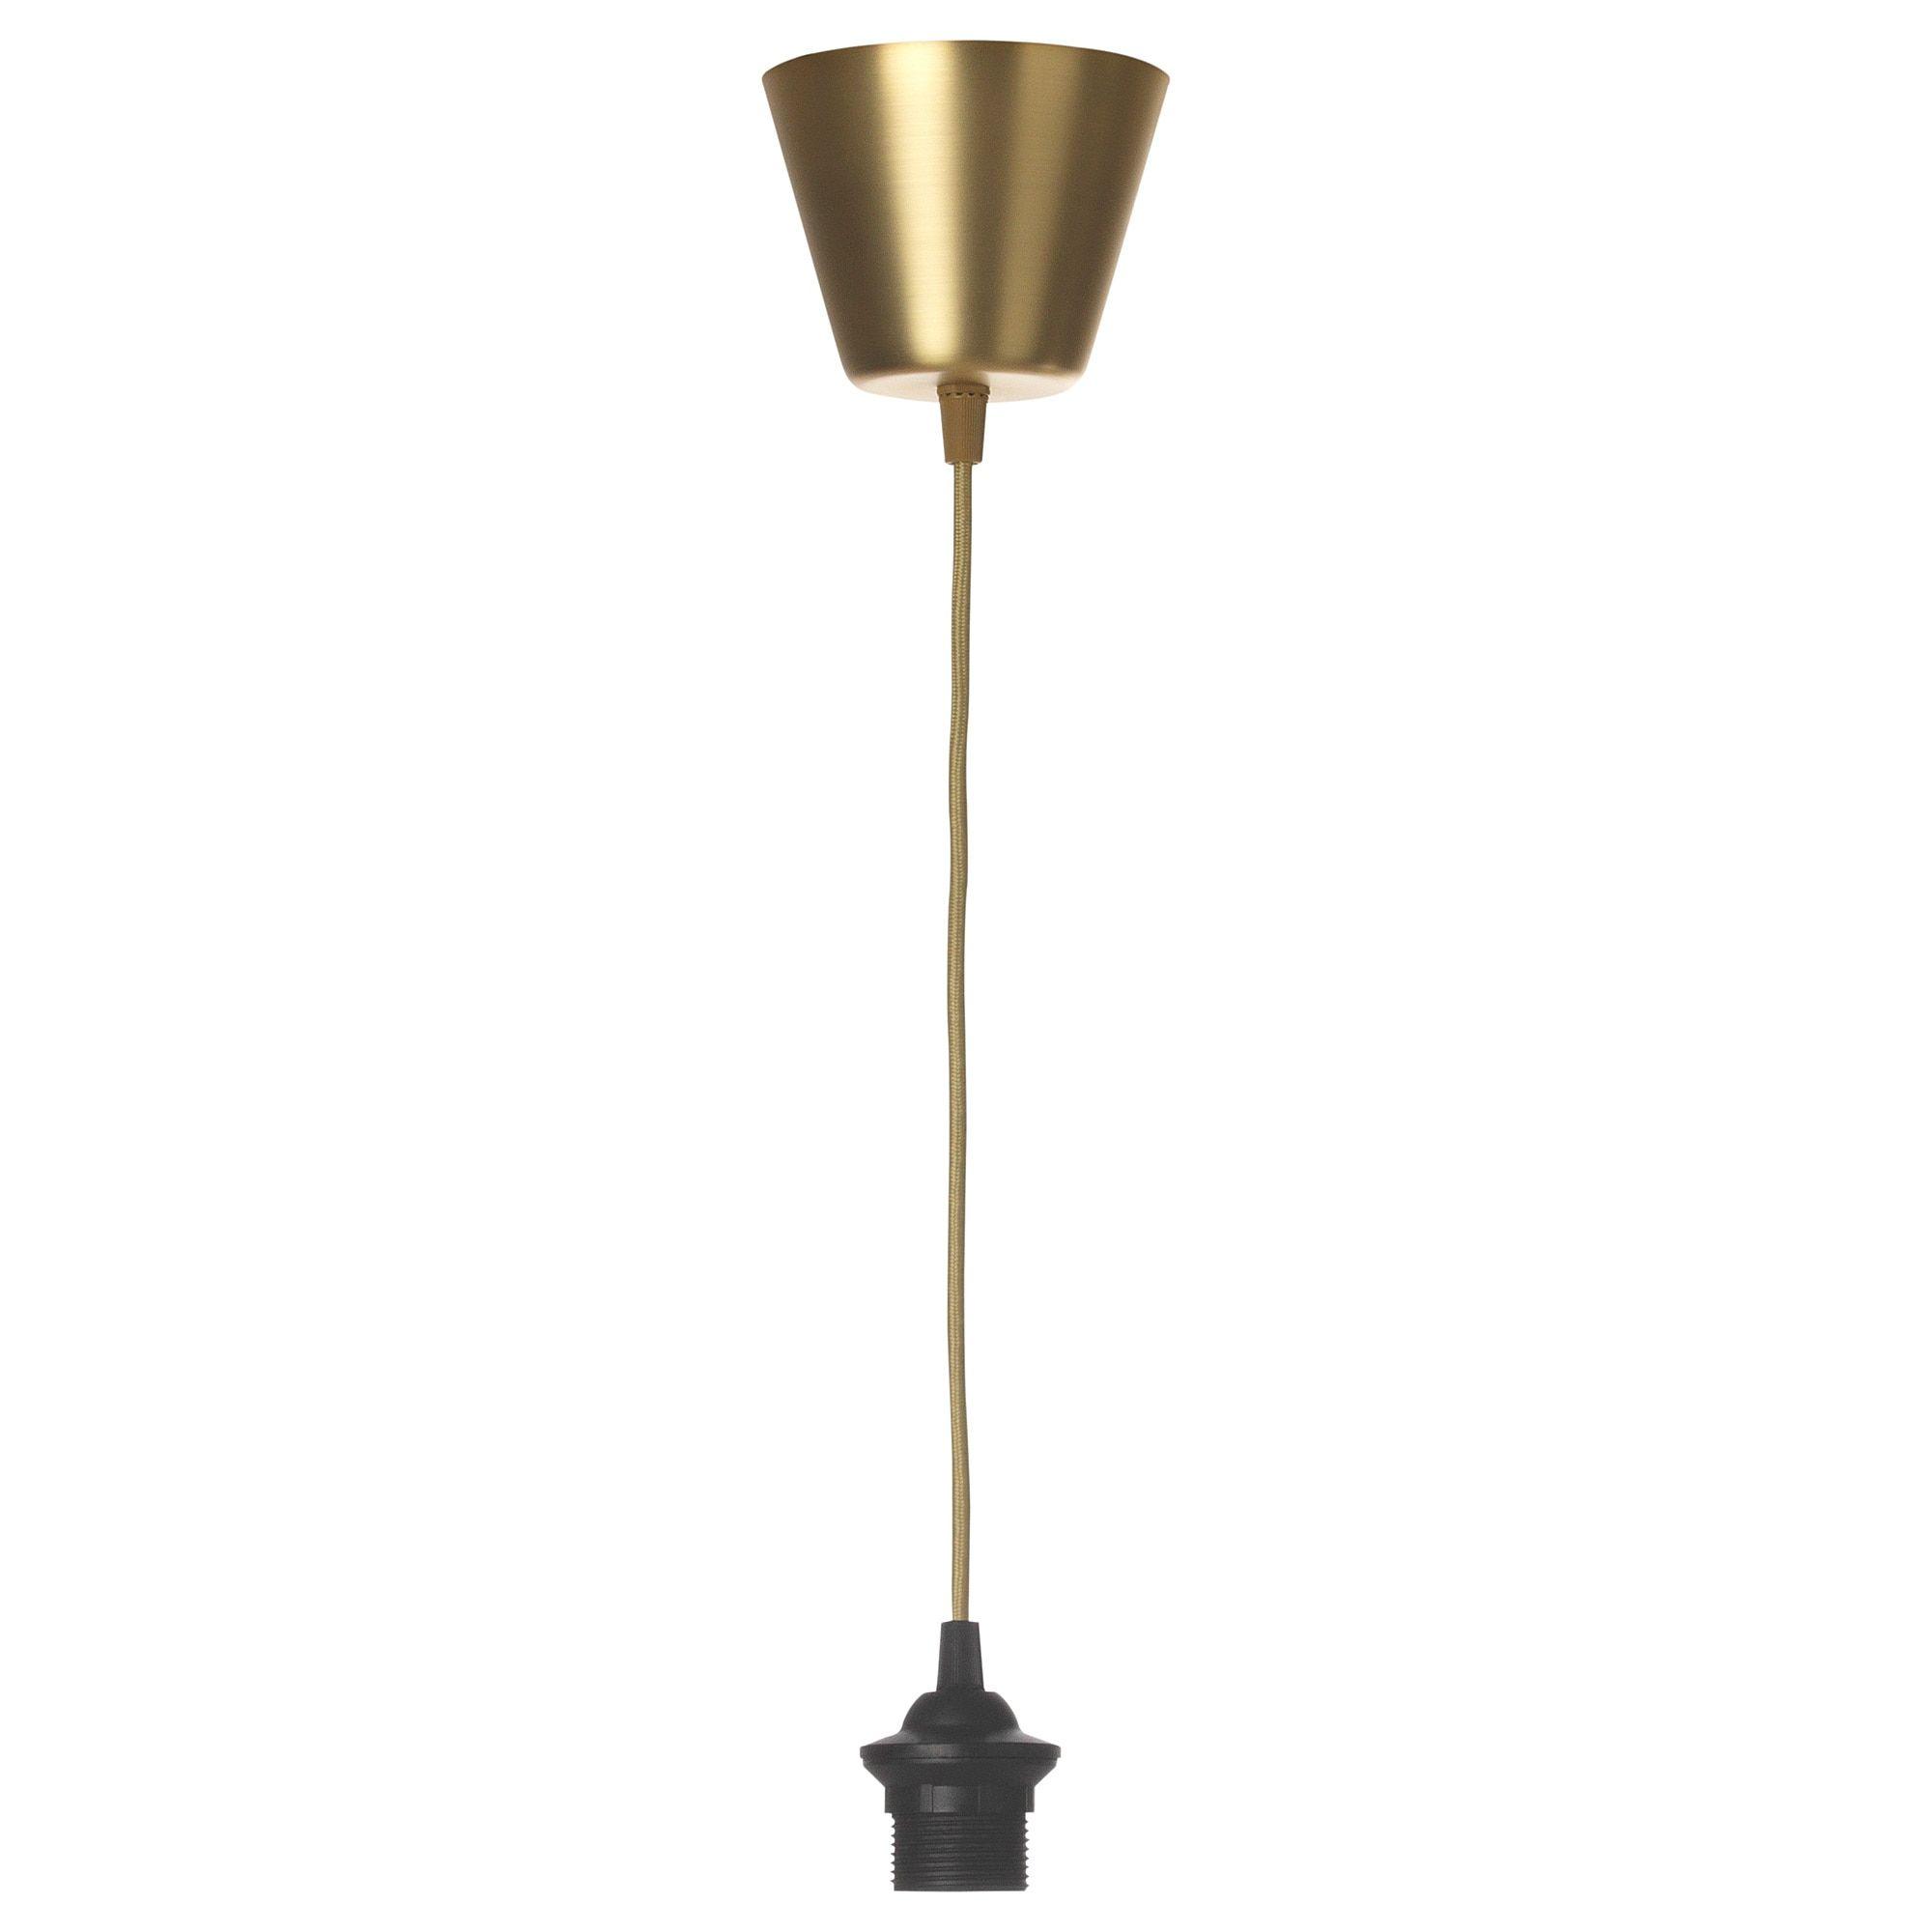 Hemma Cord Set Textile Brass Color 5 11 Brass Color Led Bulb Bulb